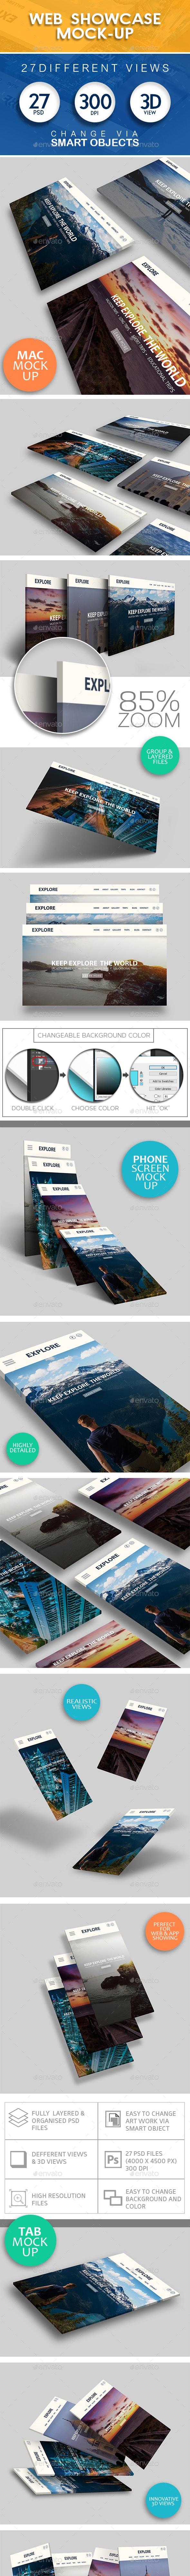 Web Showcase Mockup (27 Views) | 3D Views | Web and Mobile App Showcase - Product Mock-Ups Graphics